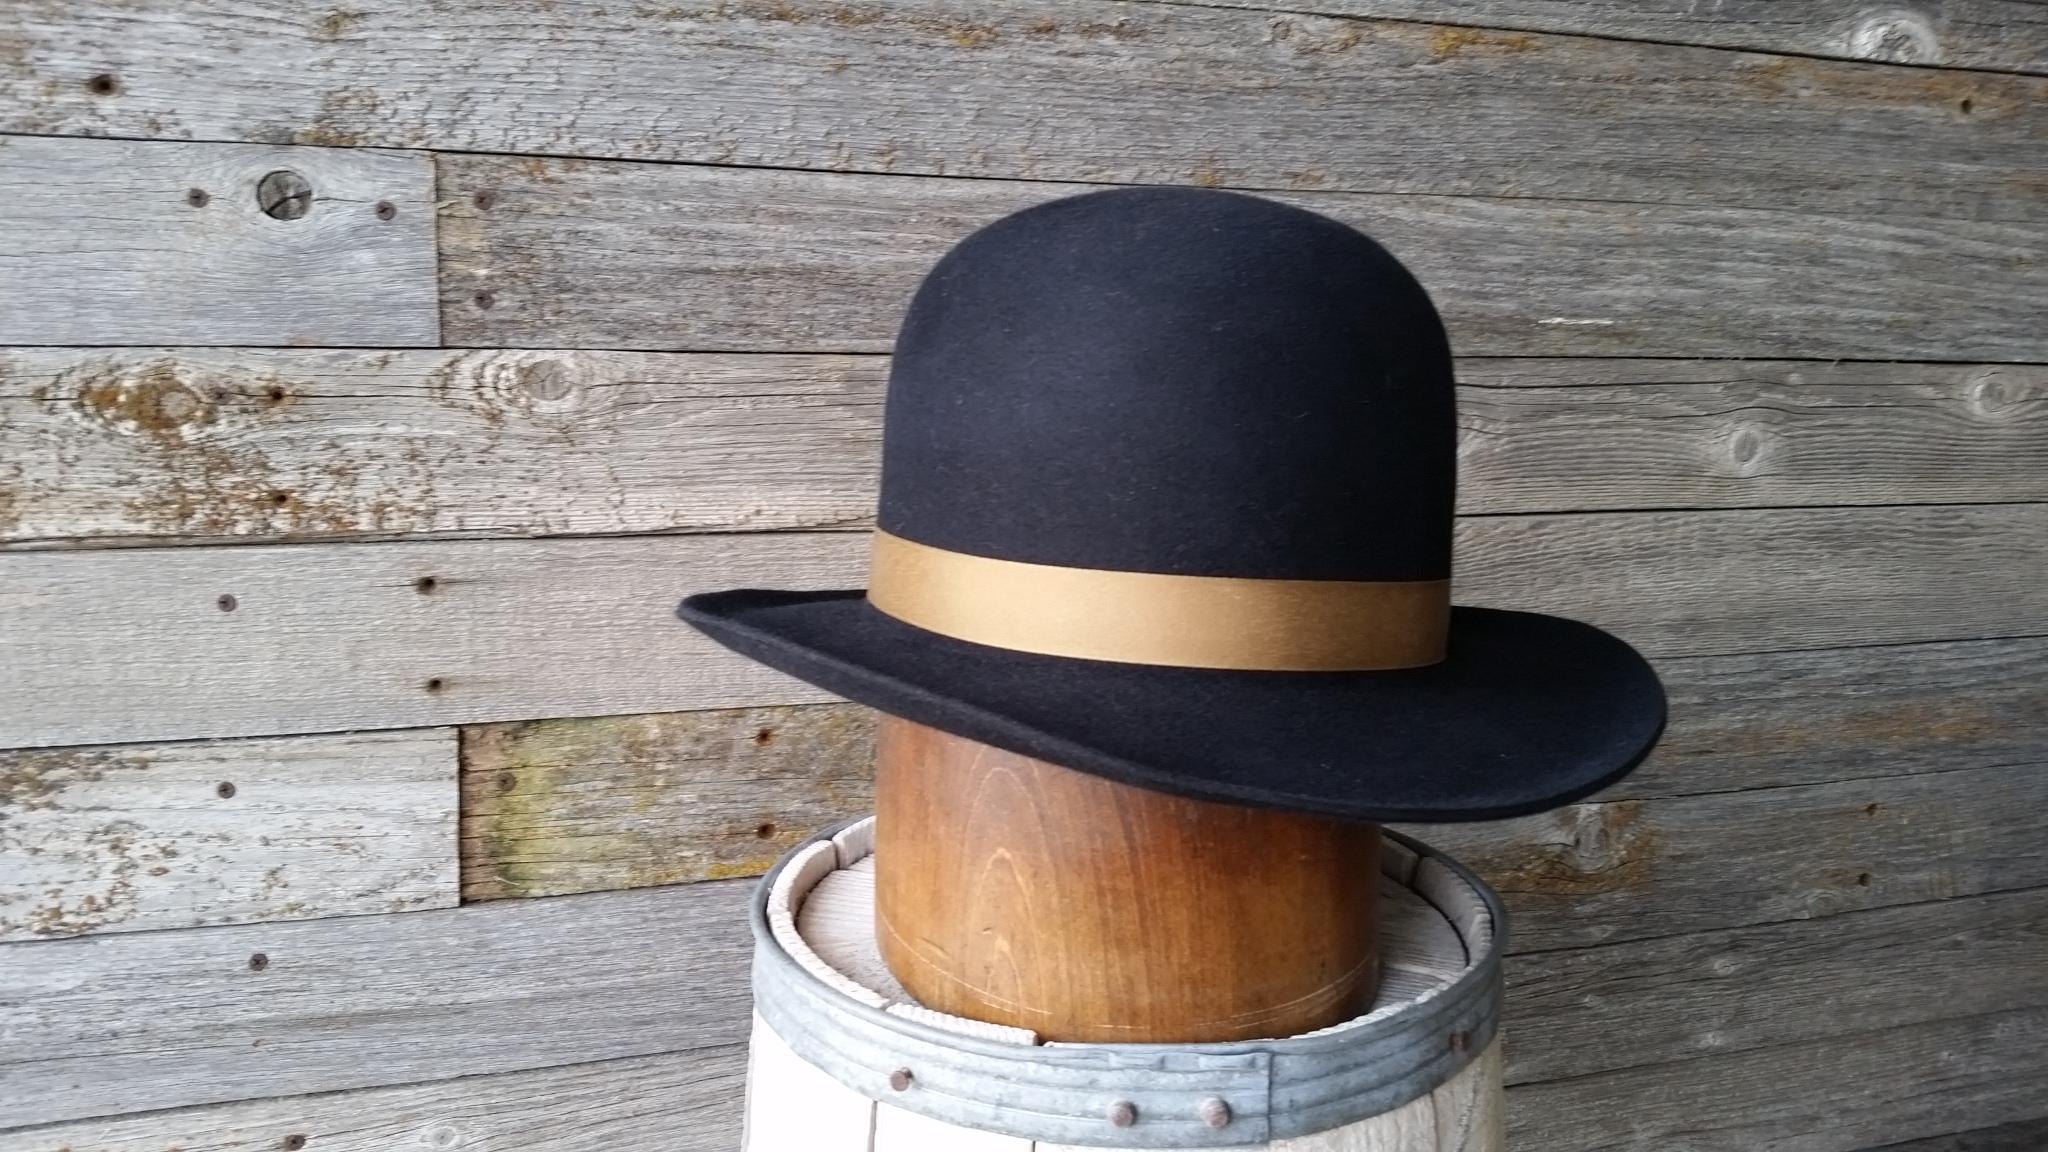 fde727d29864d Bowler hat - Staker Hats